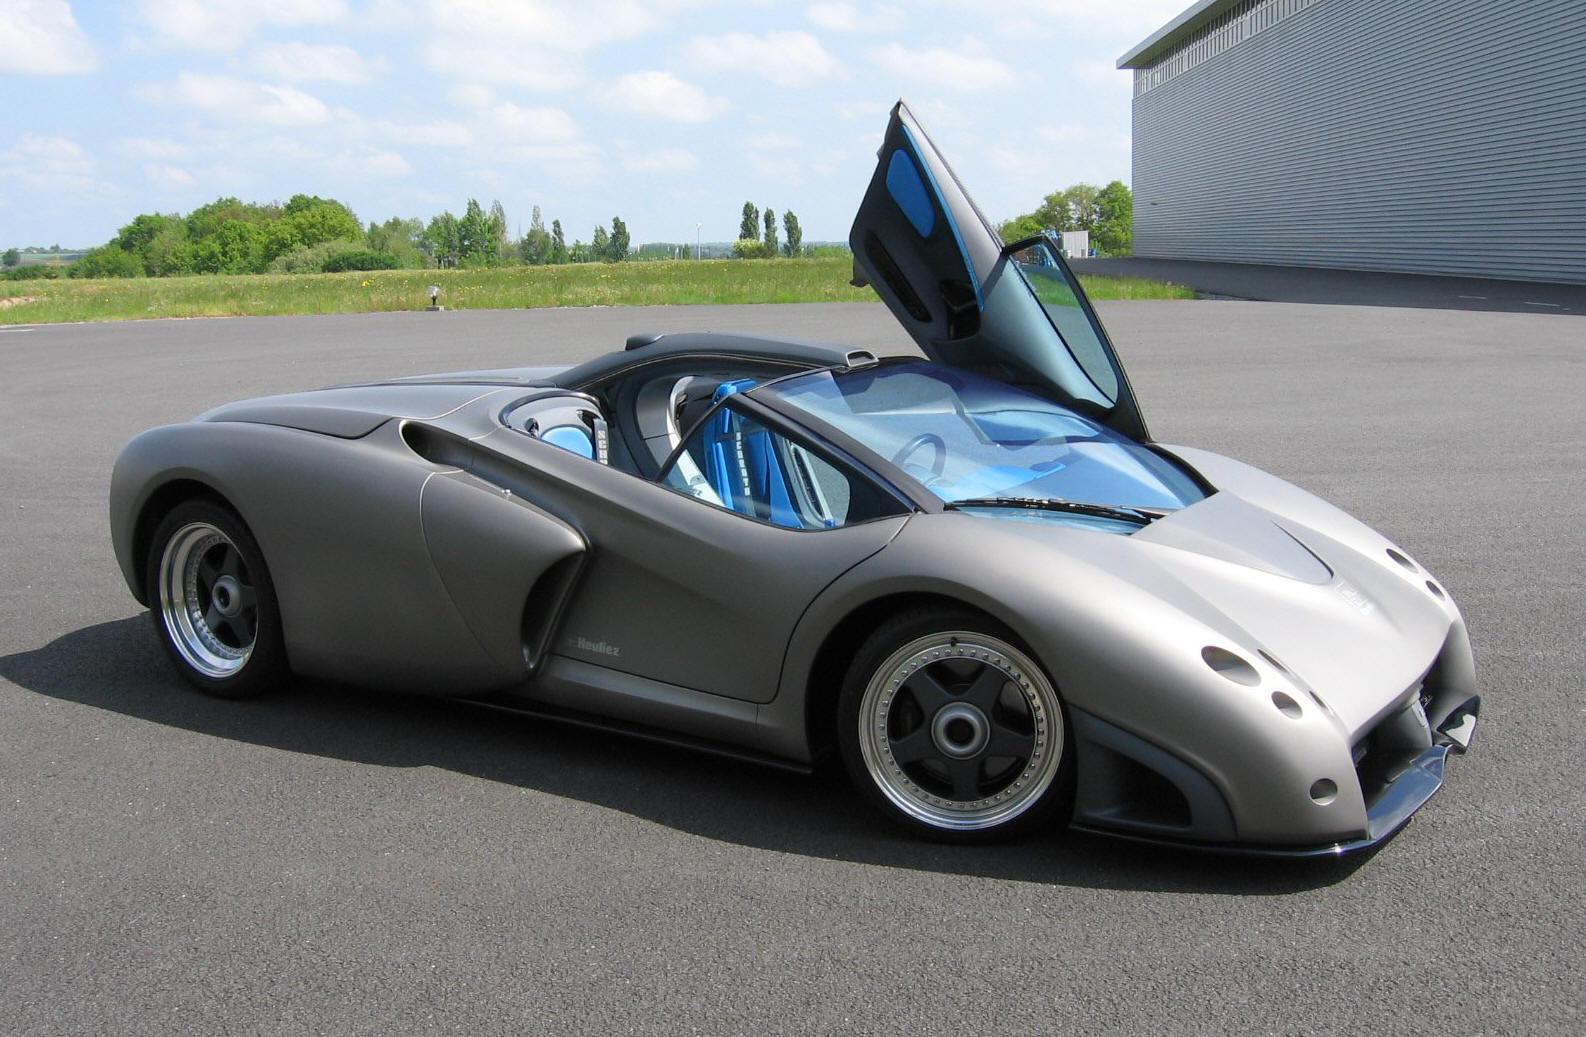 pictures athon lamborghini for value sales sale vehicle prototype rm history